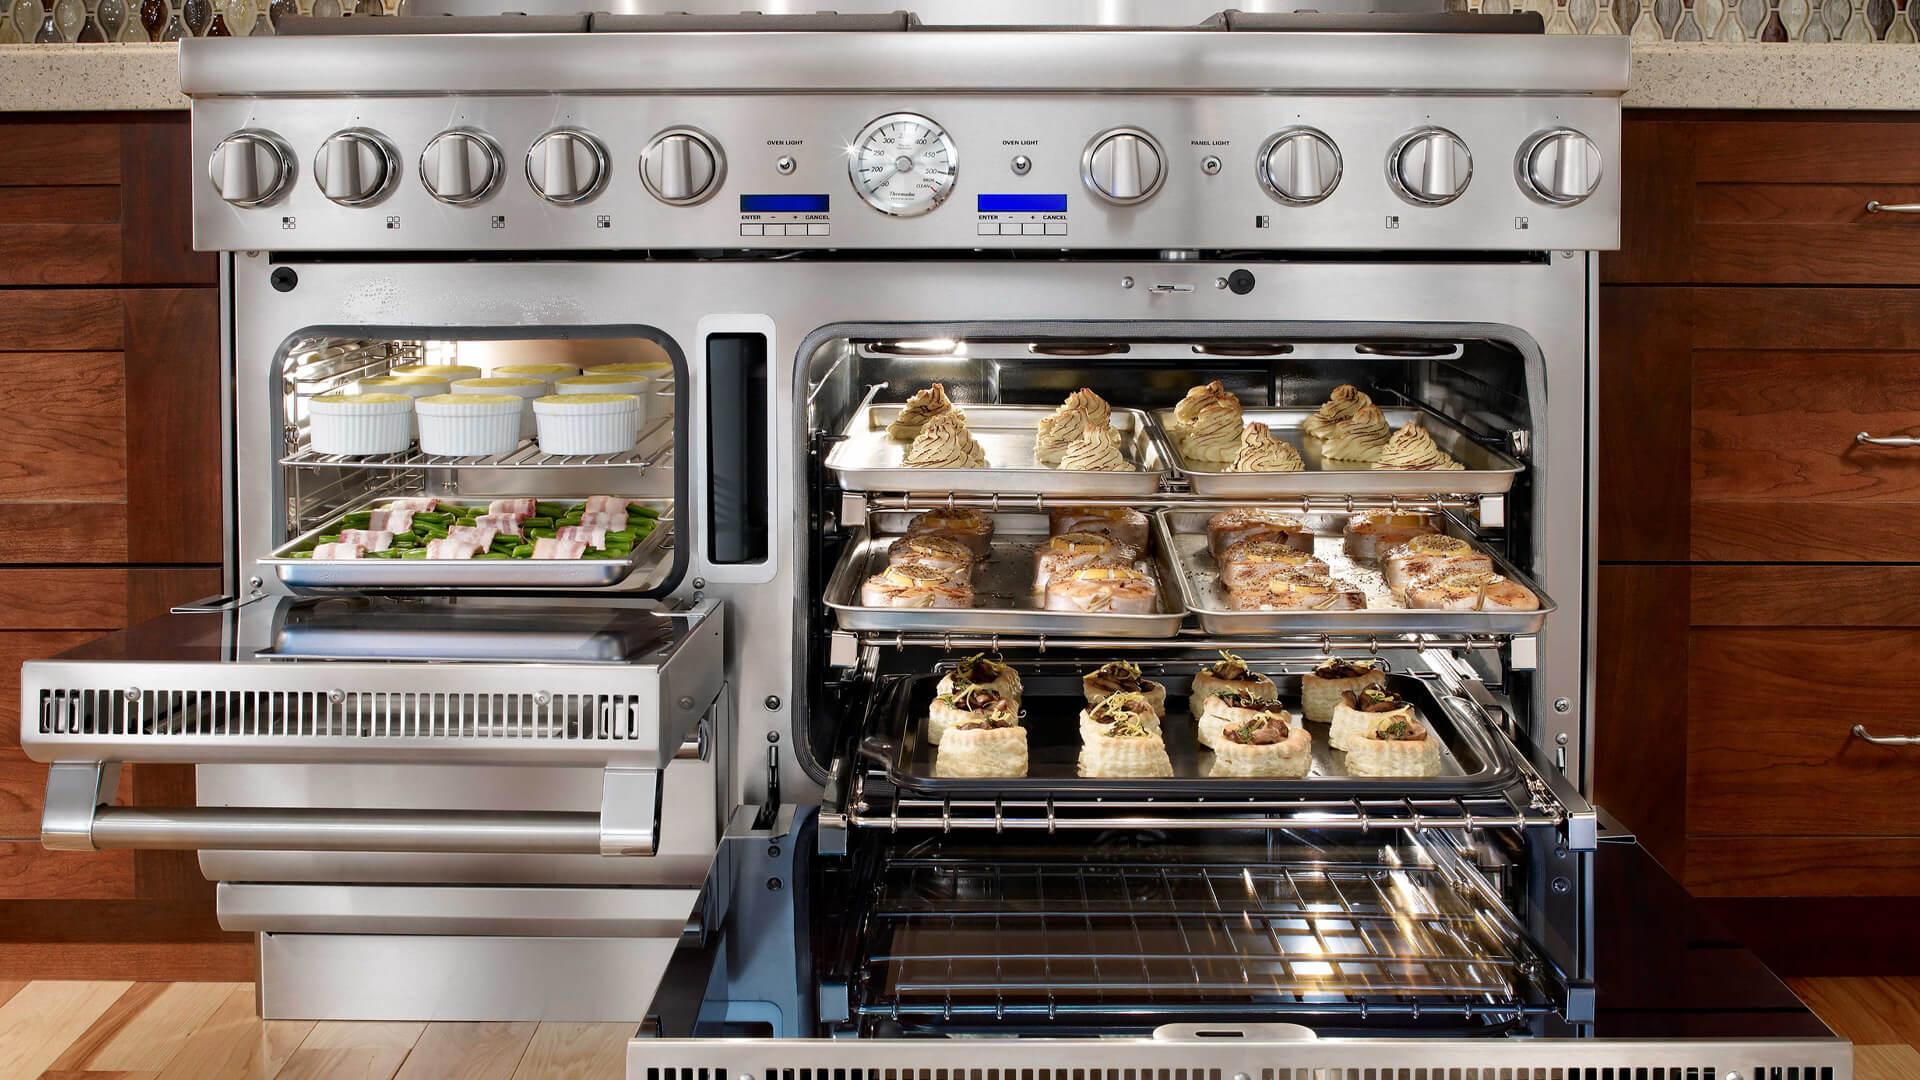 Thermador Steam Oven Repair |  Thermador Appliance Repair Pros